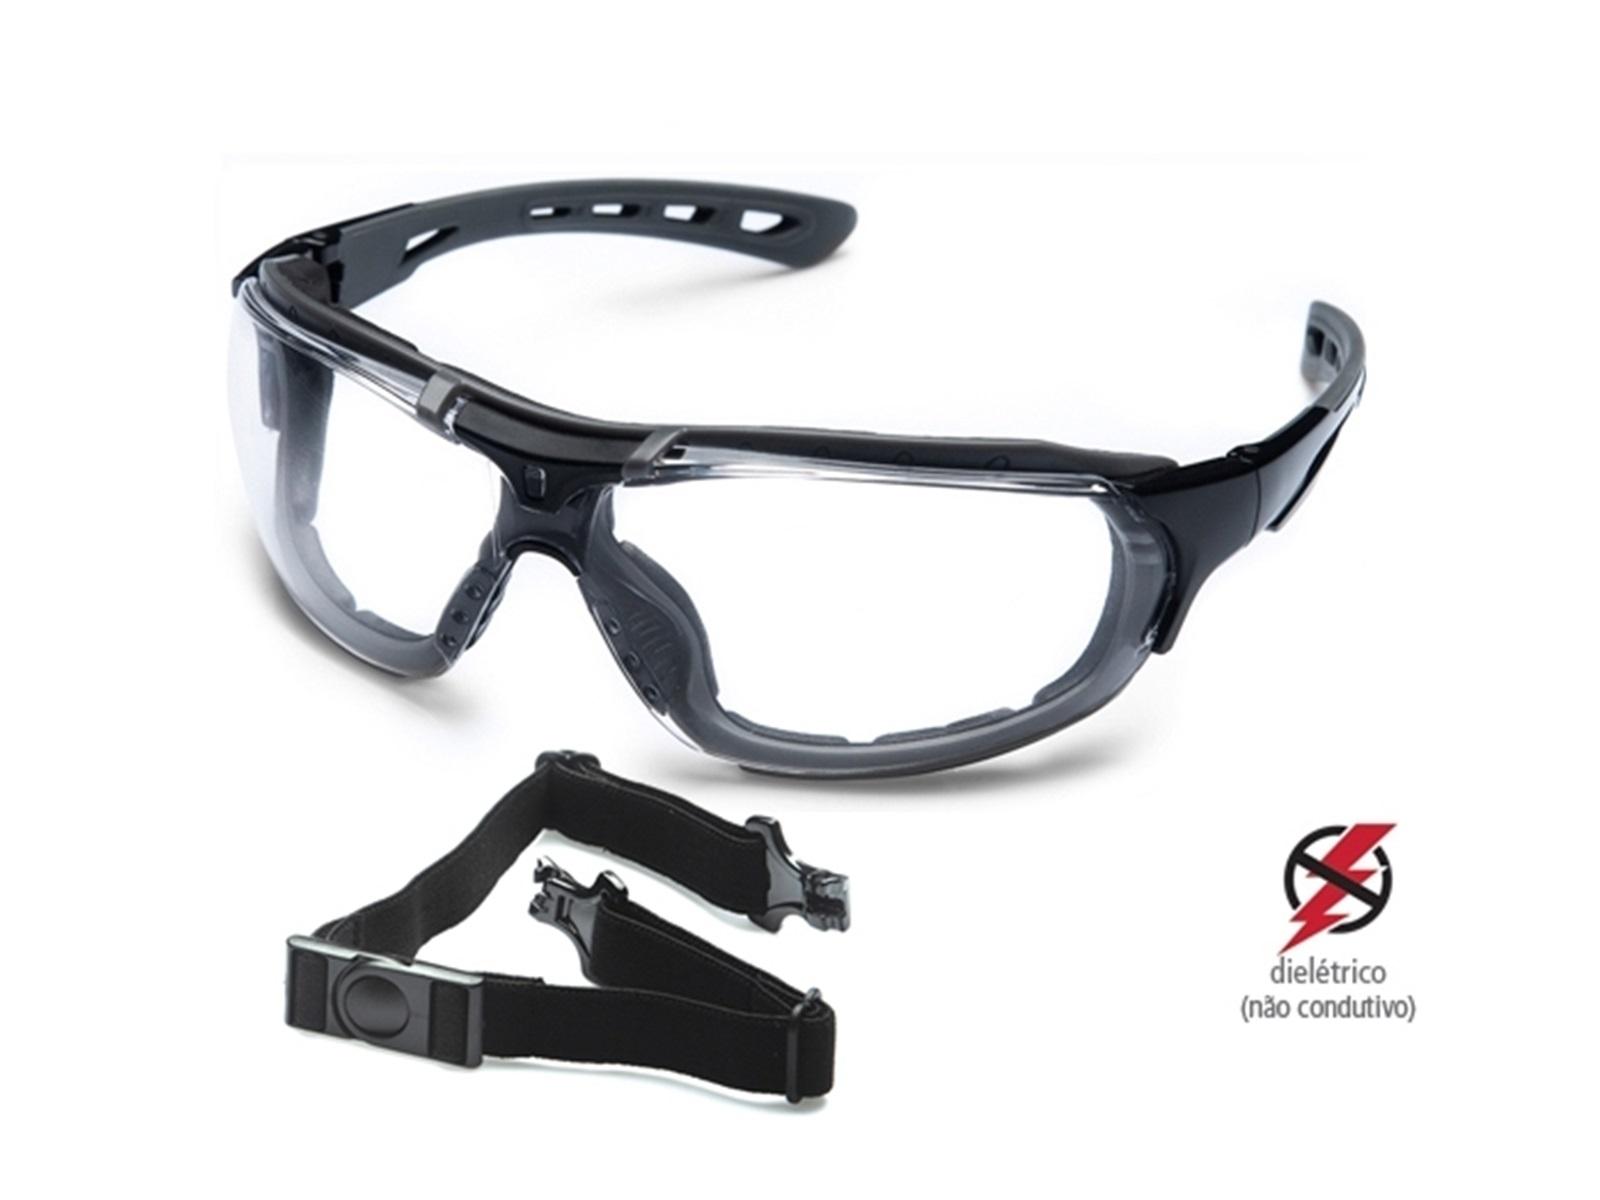 Óculos De Proteção UV Steelflex Anti Embaçante Tático Ciclista Motociclista Roma Ca 40903 ANSI Z87.1-2015  - EPM Acessórios